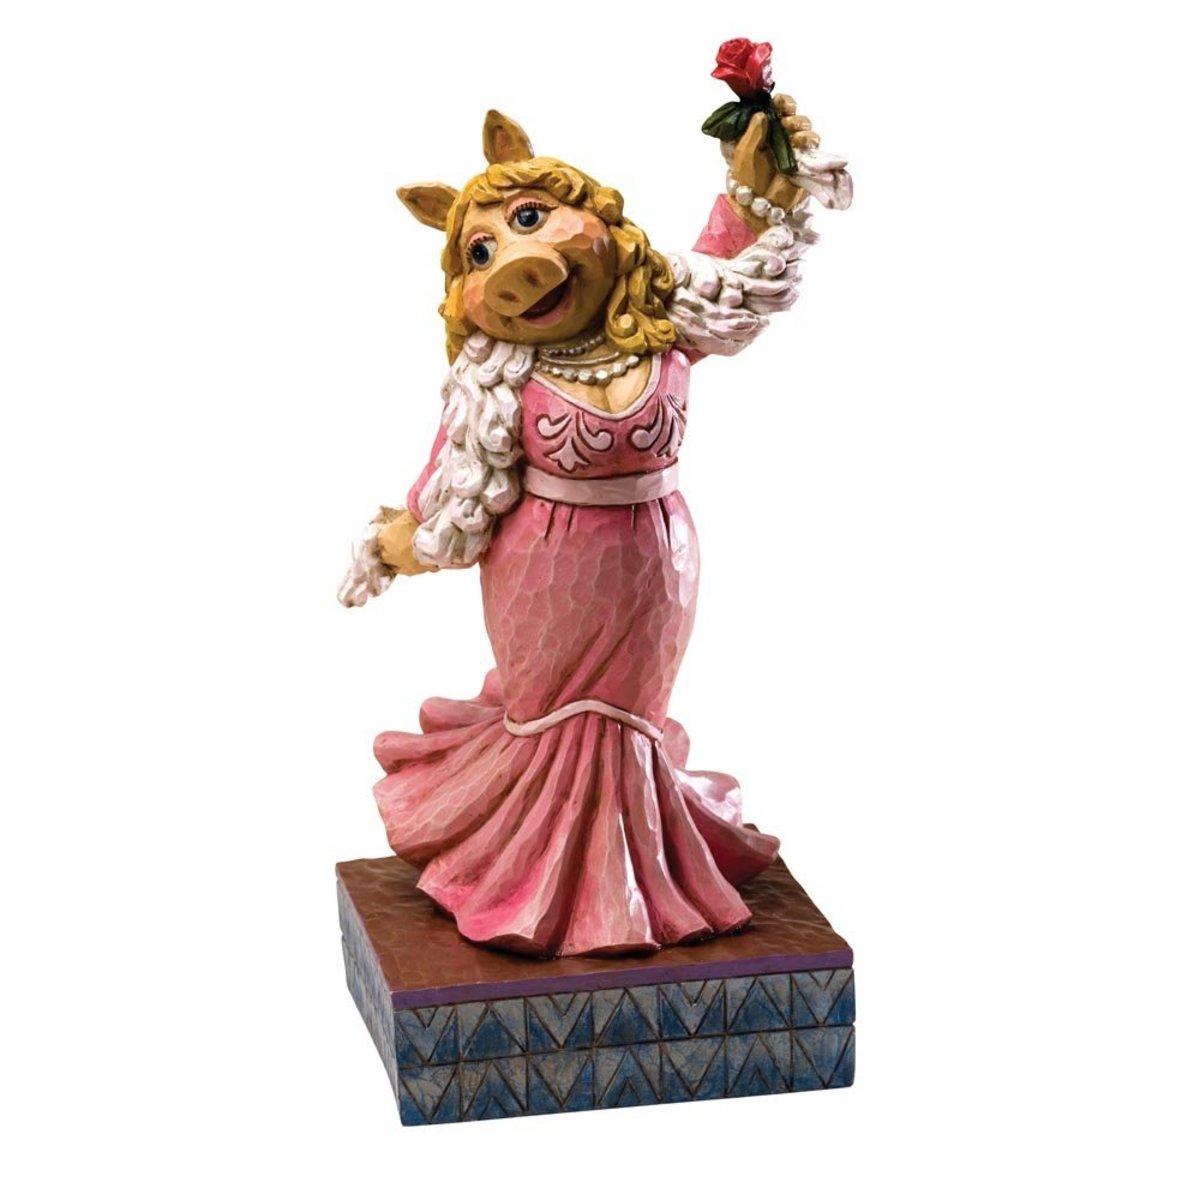 Miss Piggy by Jim Shore